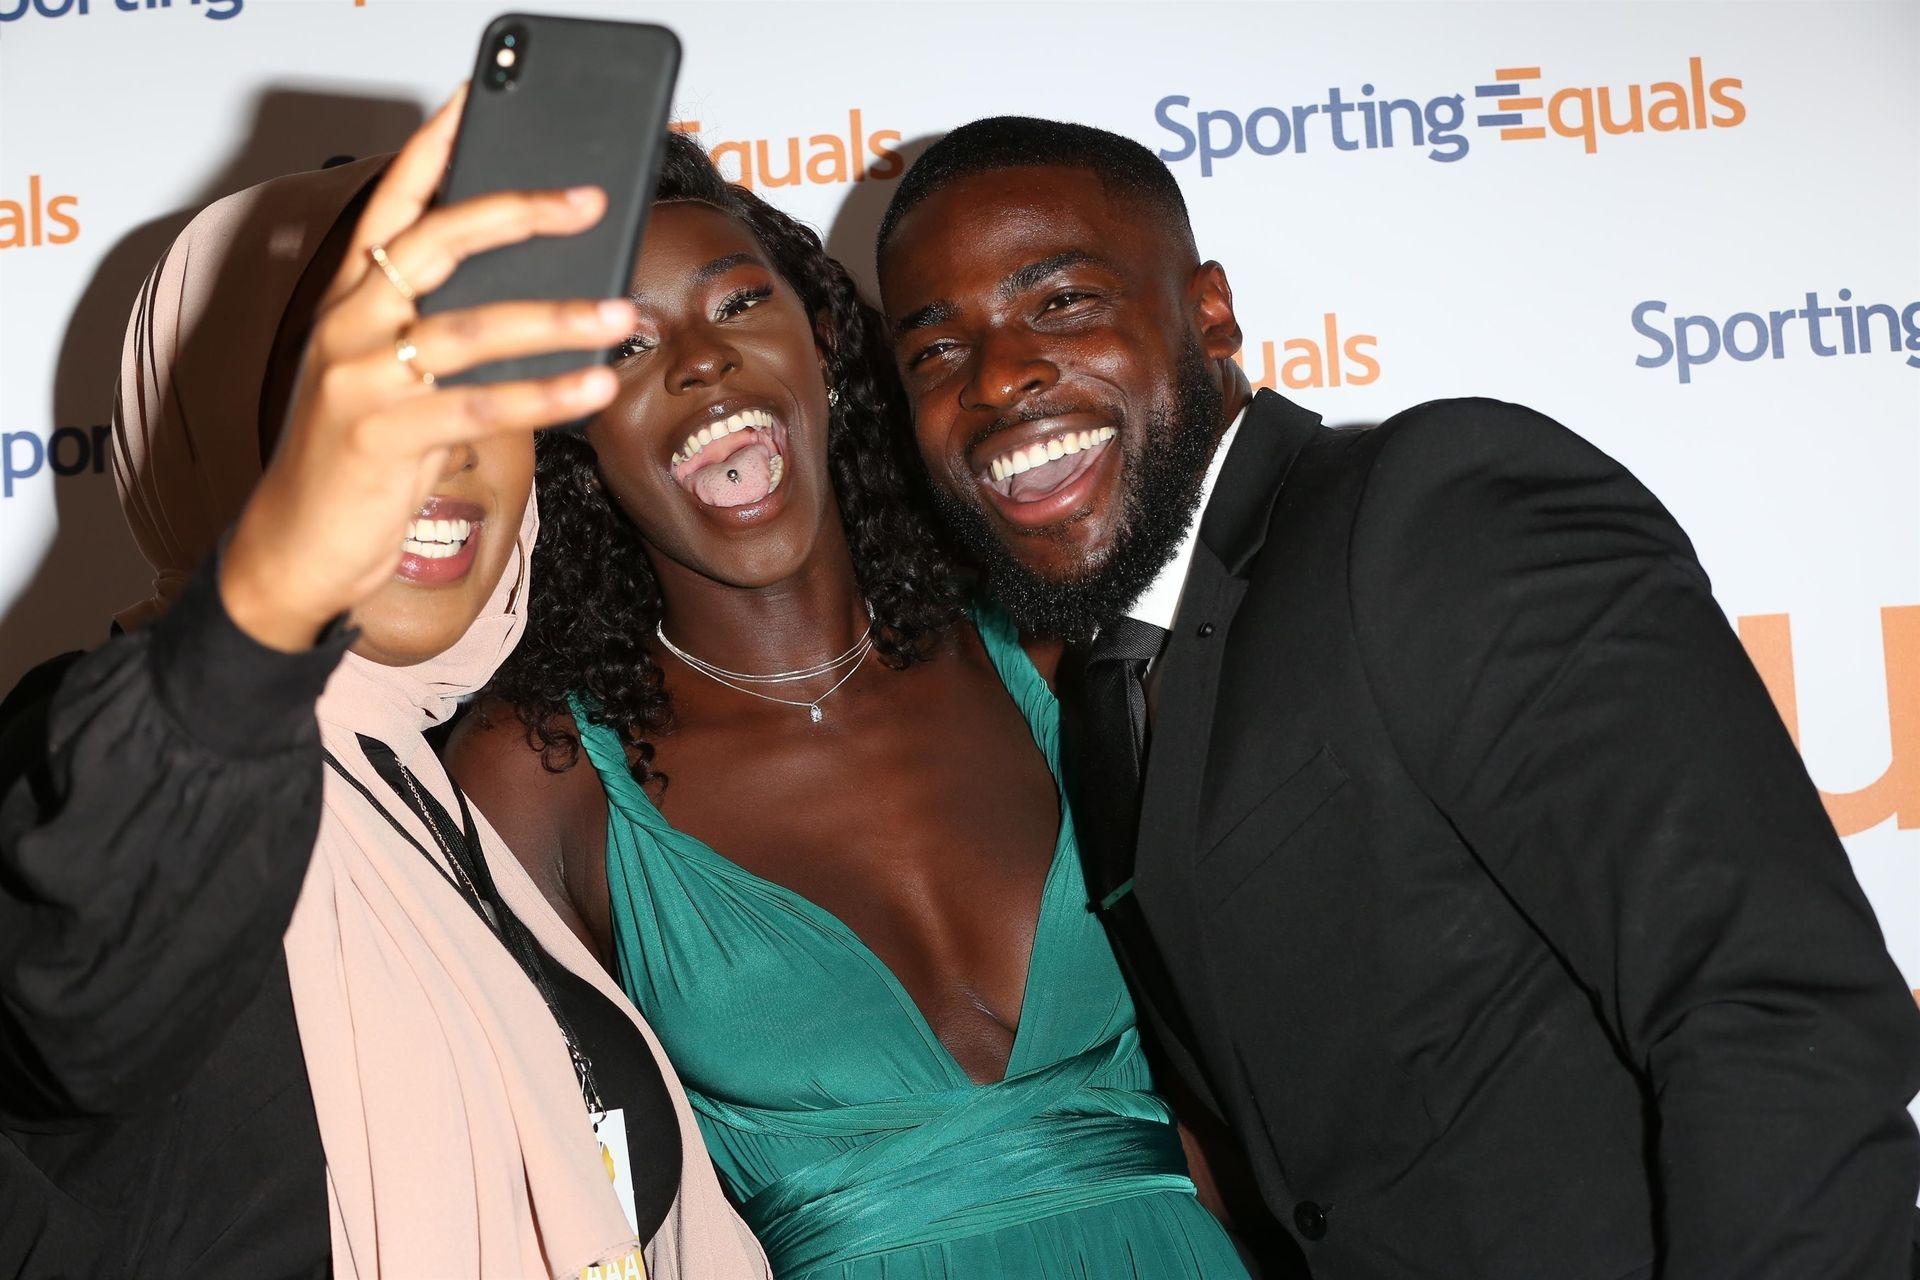 Mike Boateng & Priscilla Anyabu Are Seen At British Ethnic Diversity Sports Awards 0078